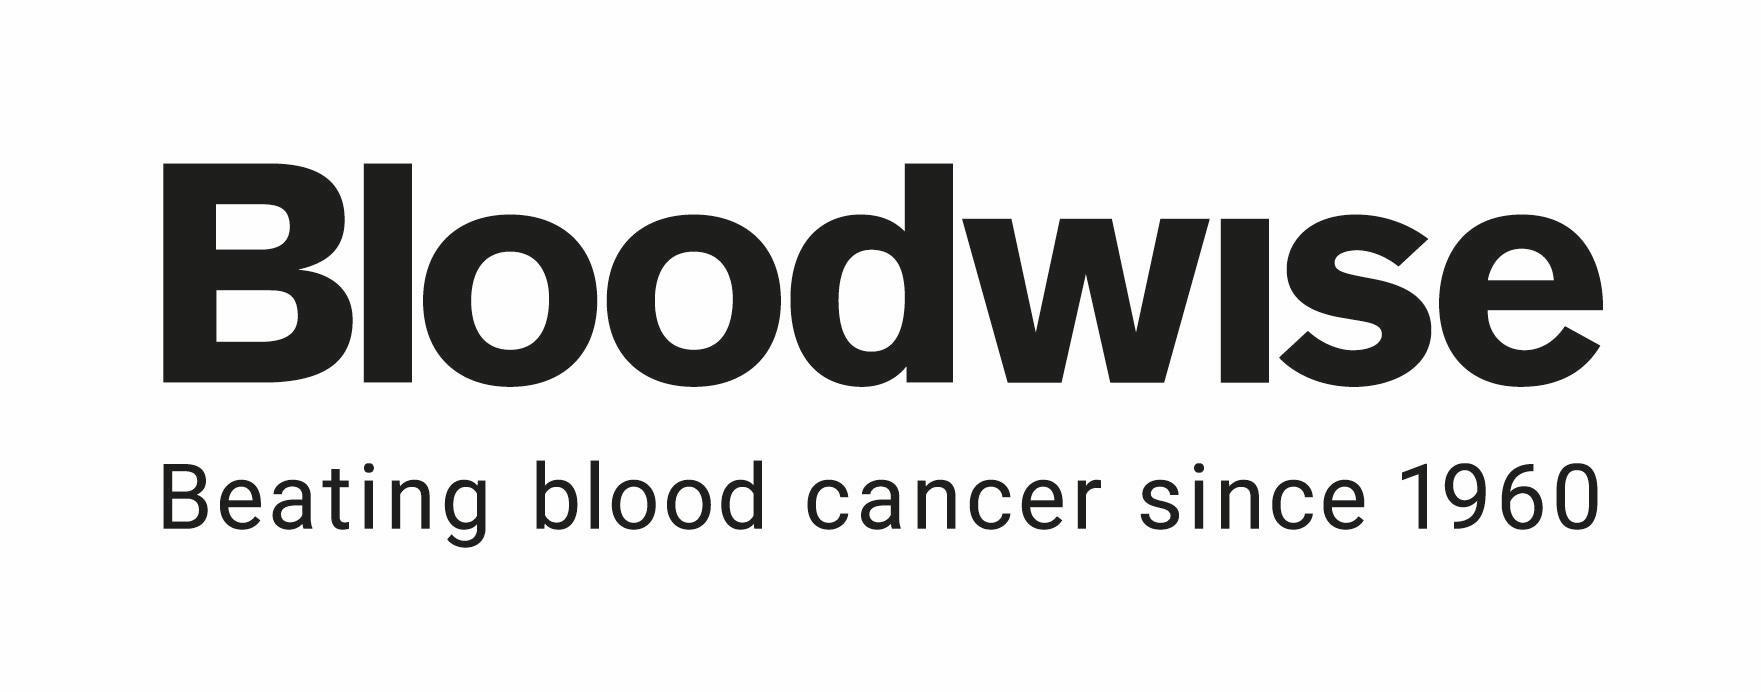 Bloodwise Logo